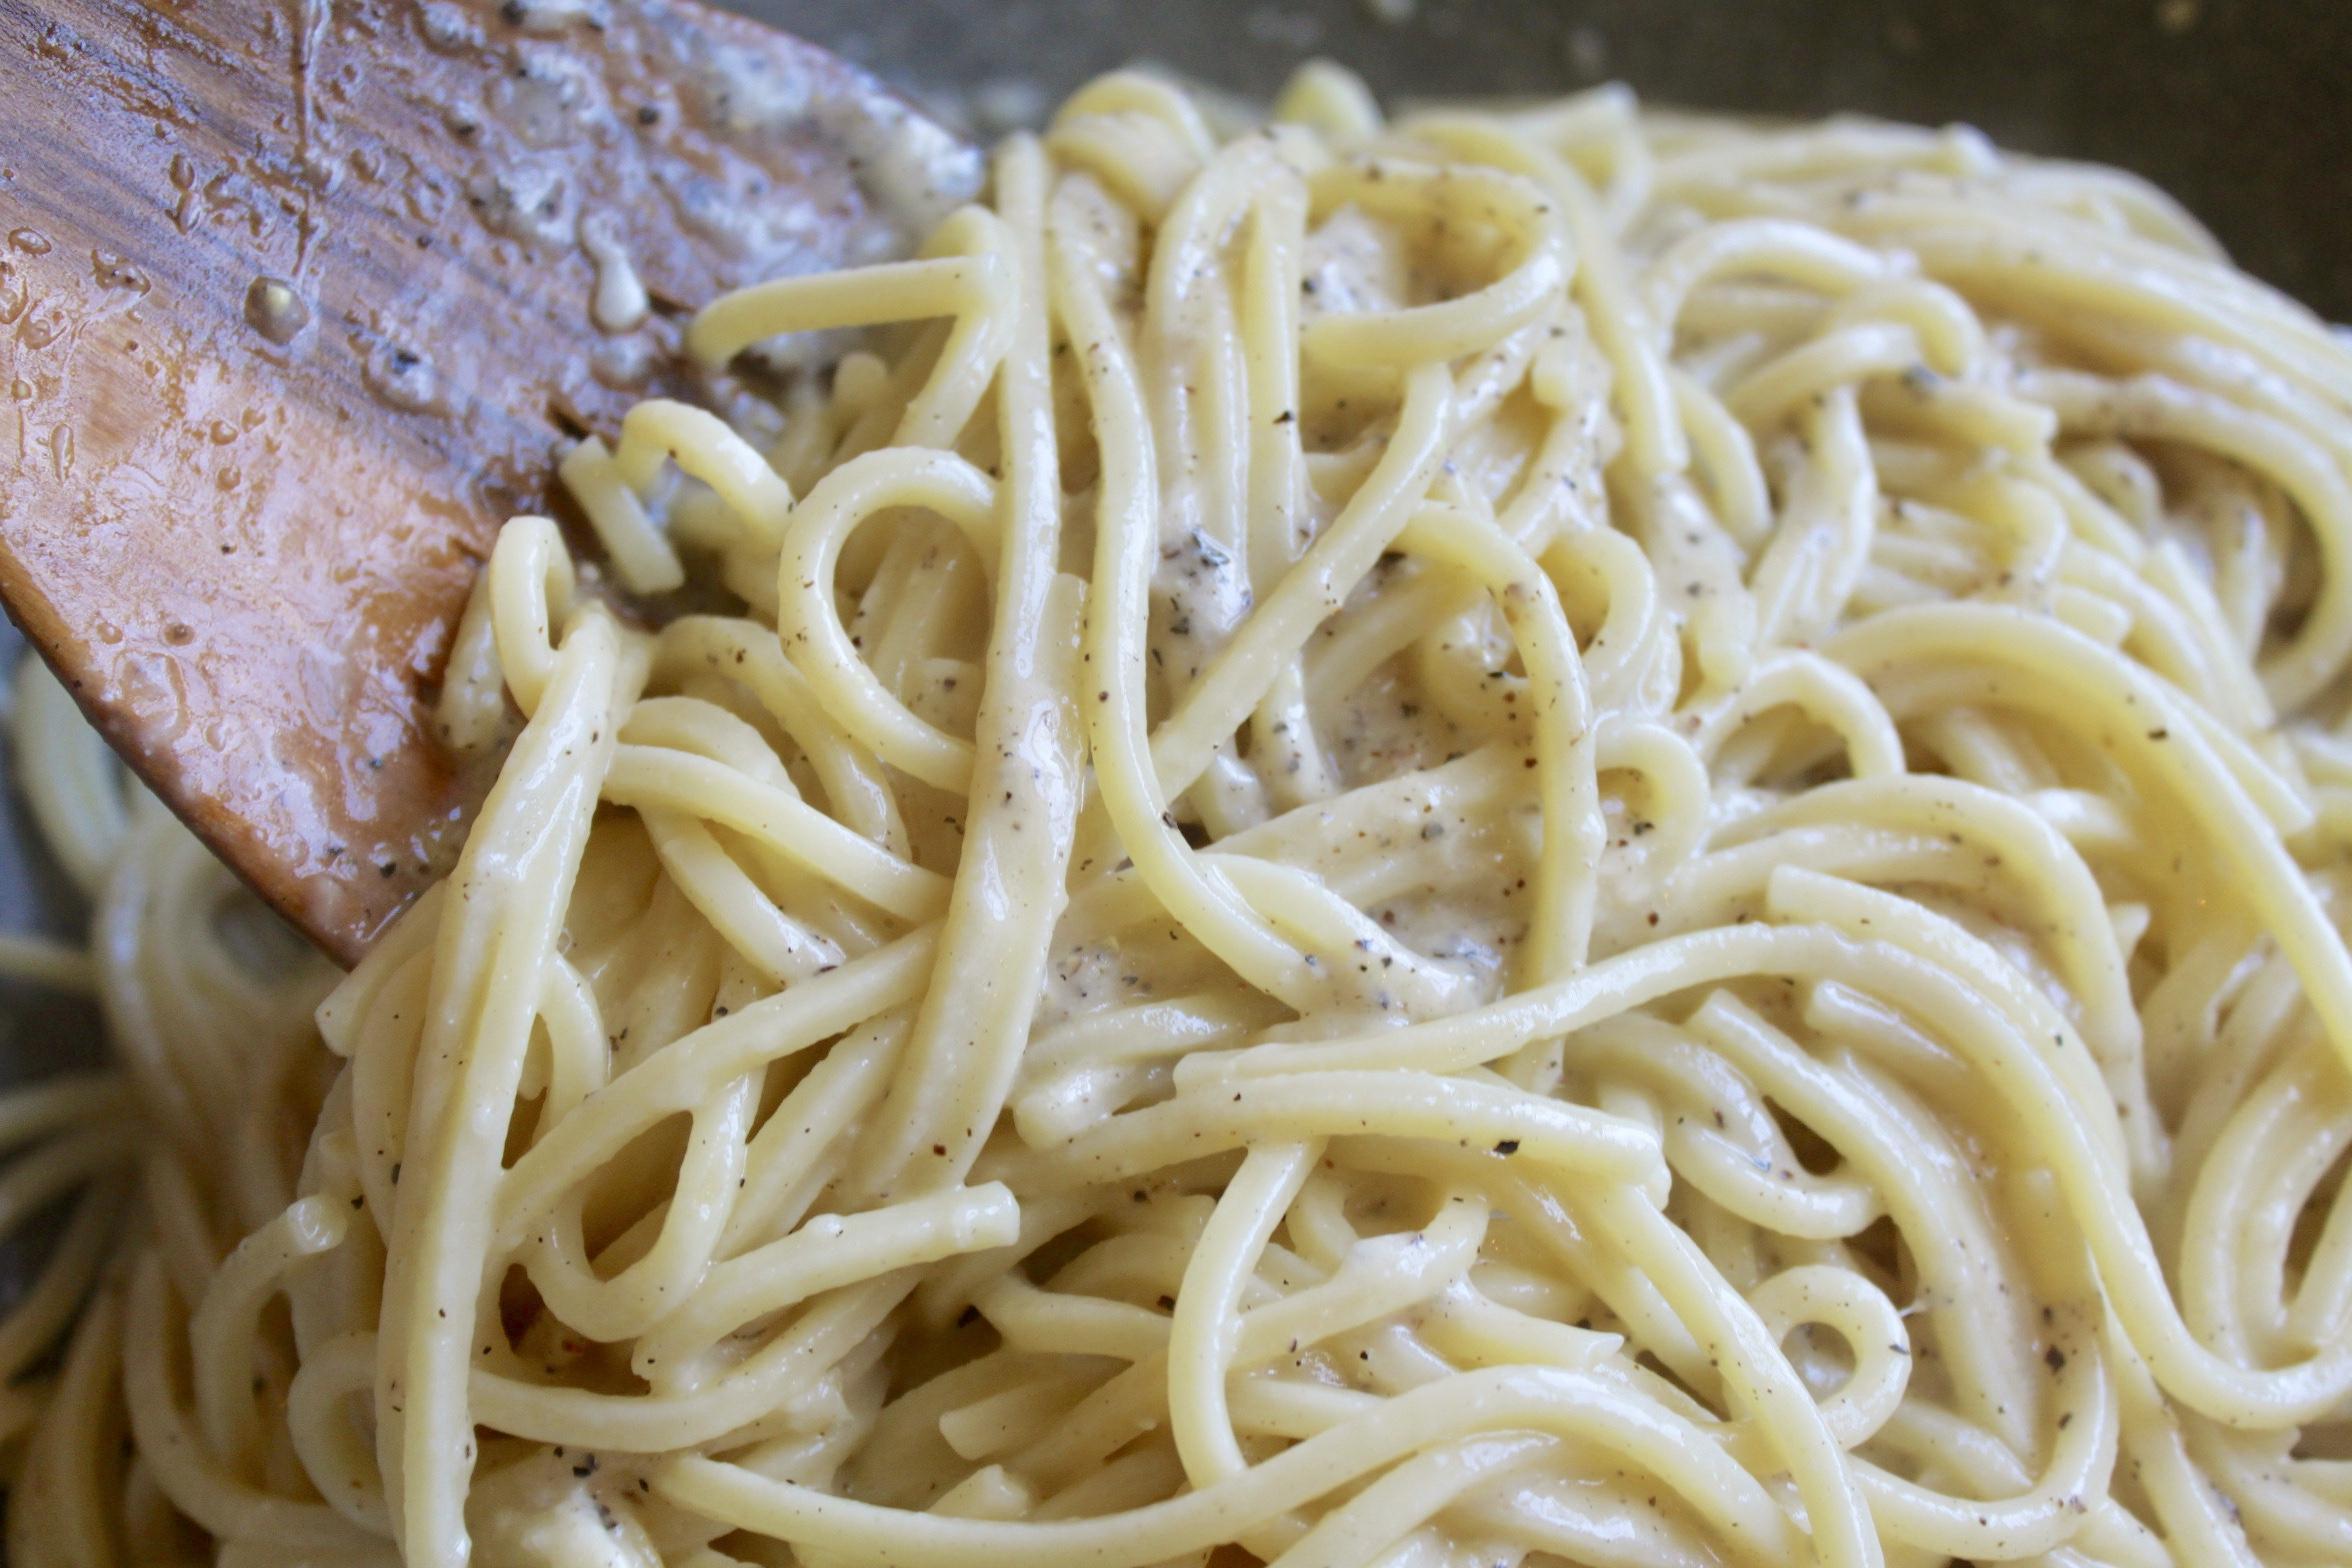 stirring the pasta